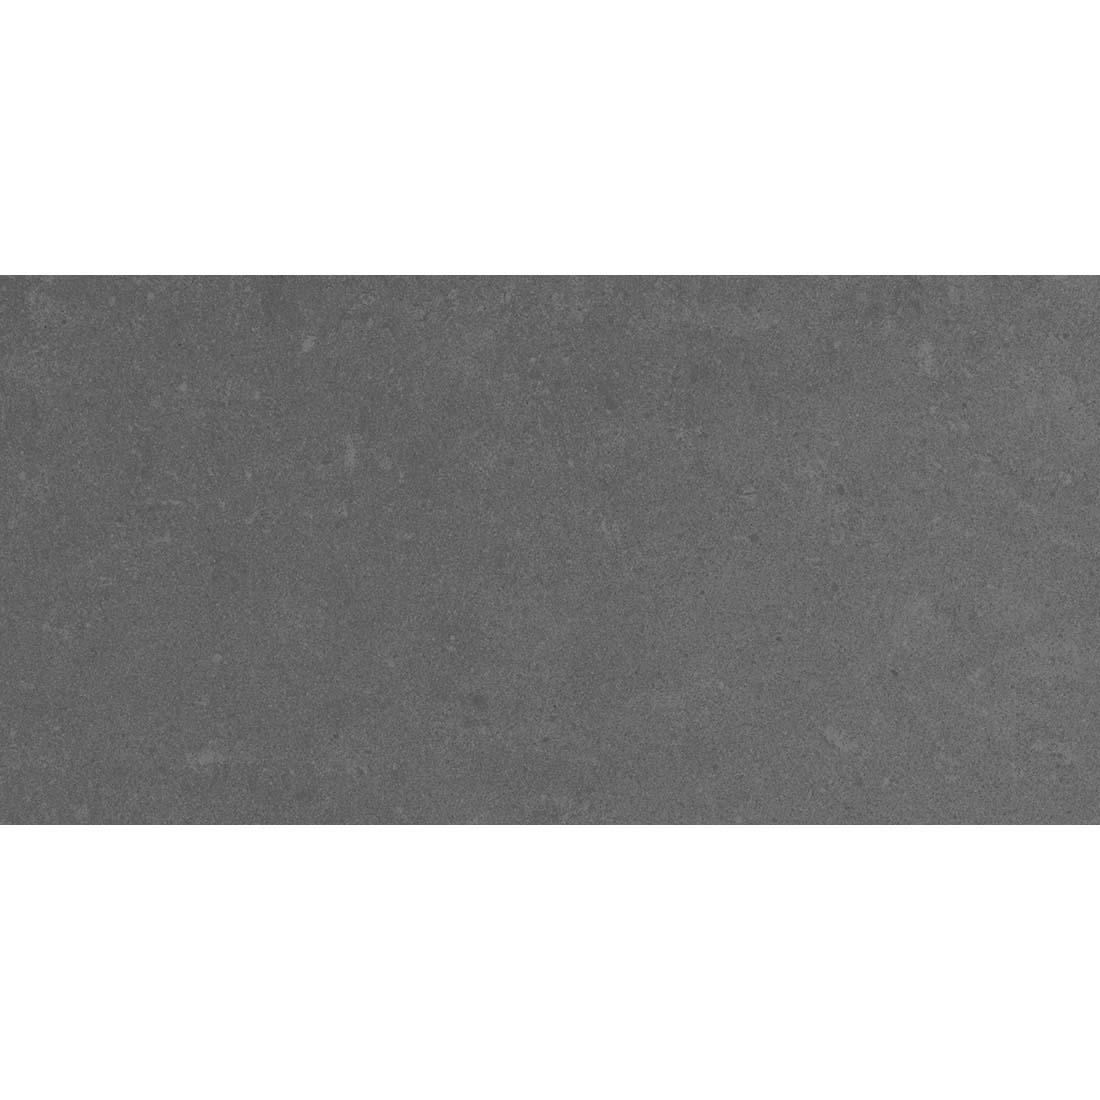 Jumeirah 30x60 Dark Grey Matt 1